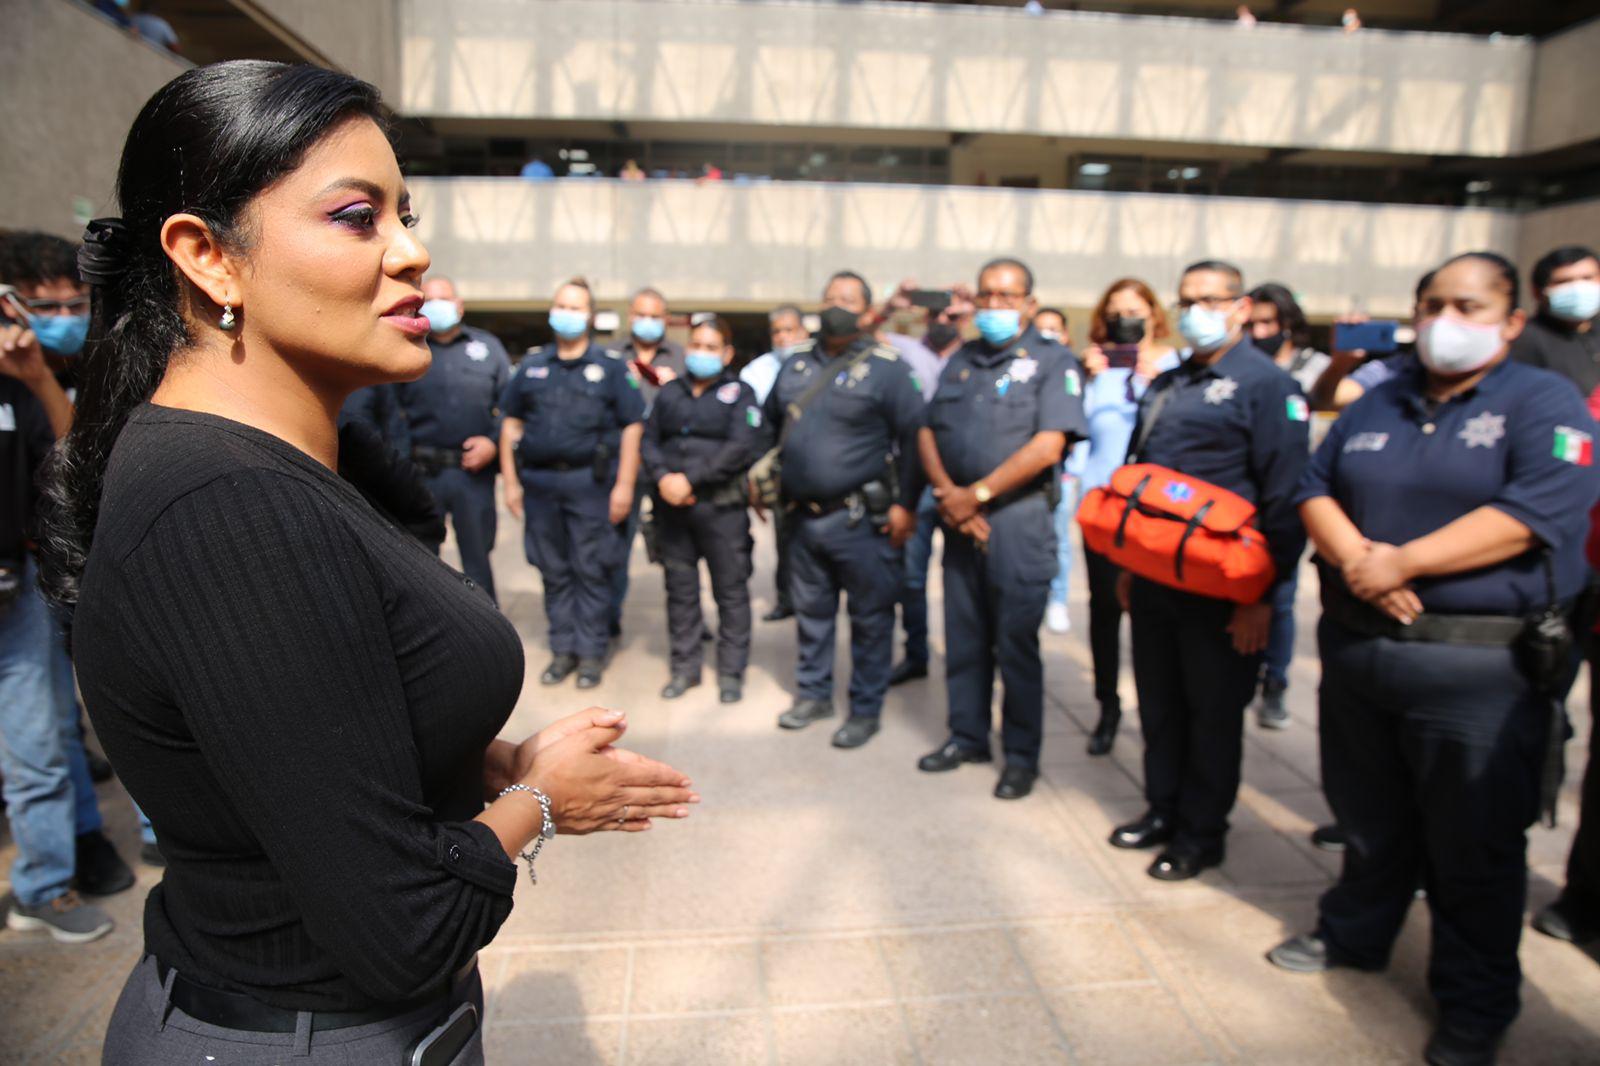 Montserrat-Caballero-se-presenta-ante-policias